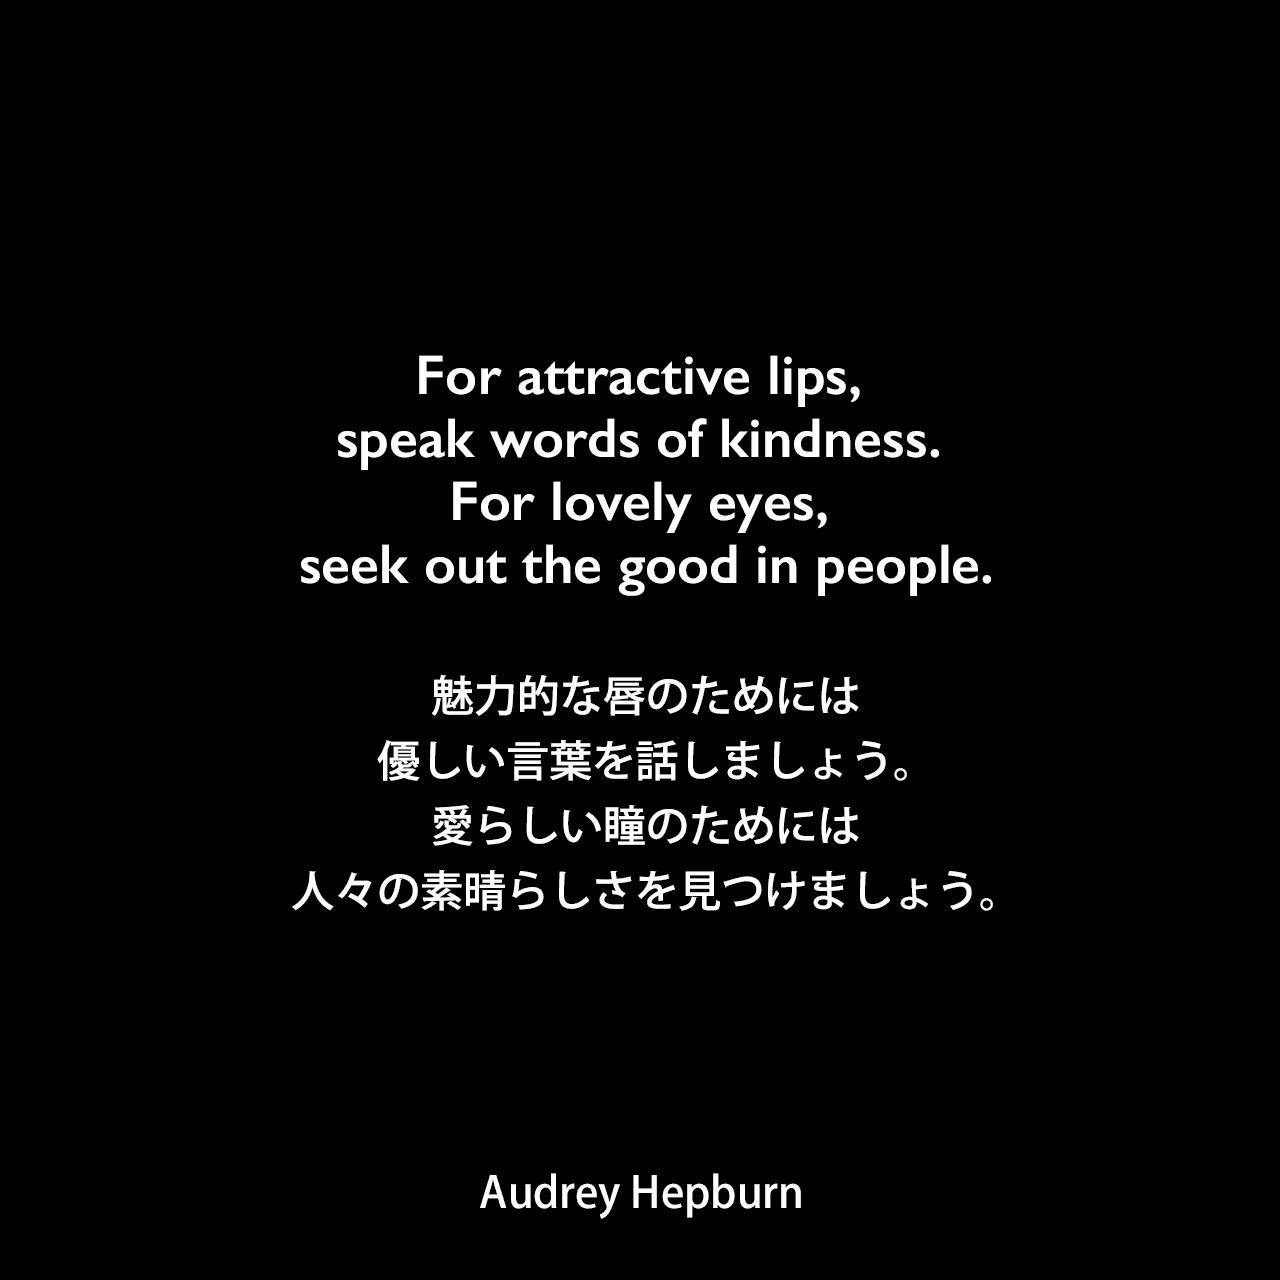 For attractive lips, speak words of kindness. For lovely eyes, seek out the good in people.魅力的な唇のためには、優しい言葉を話しましょう。愛らしい瞳のためには、人々の素晴らしさを見つけましょう。Audrey Hepburn